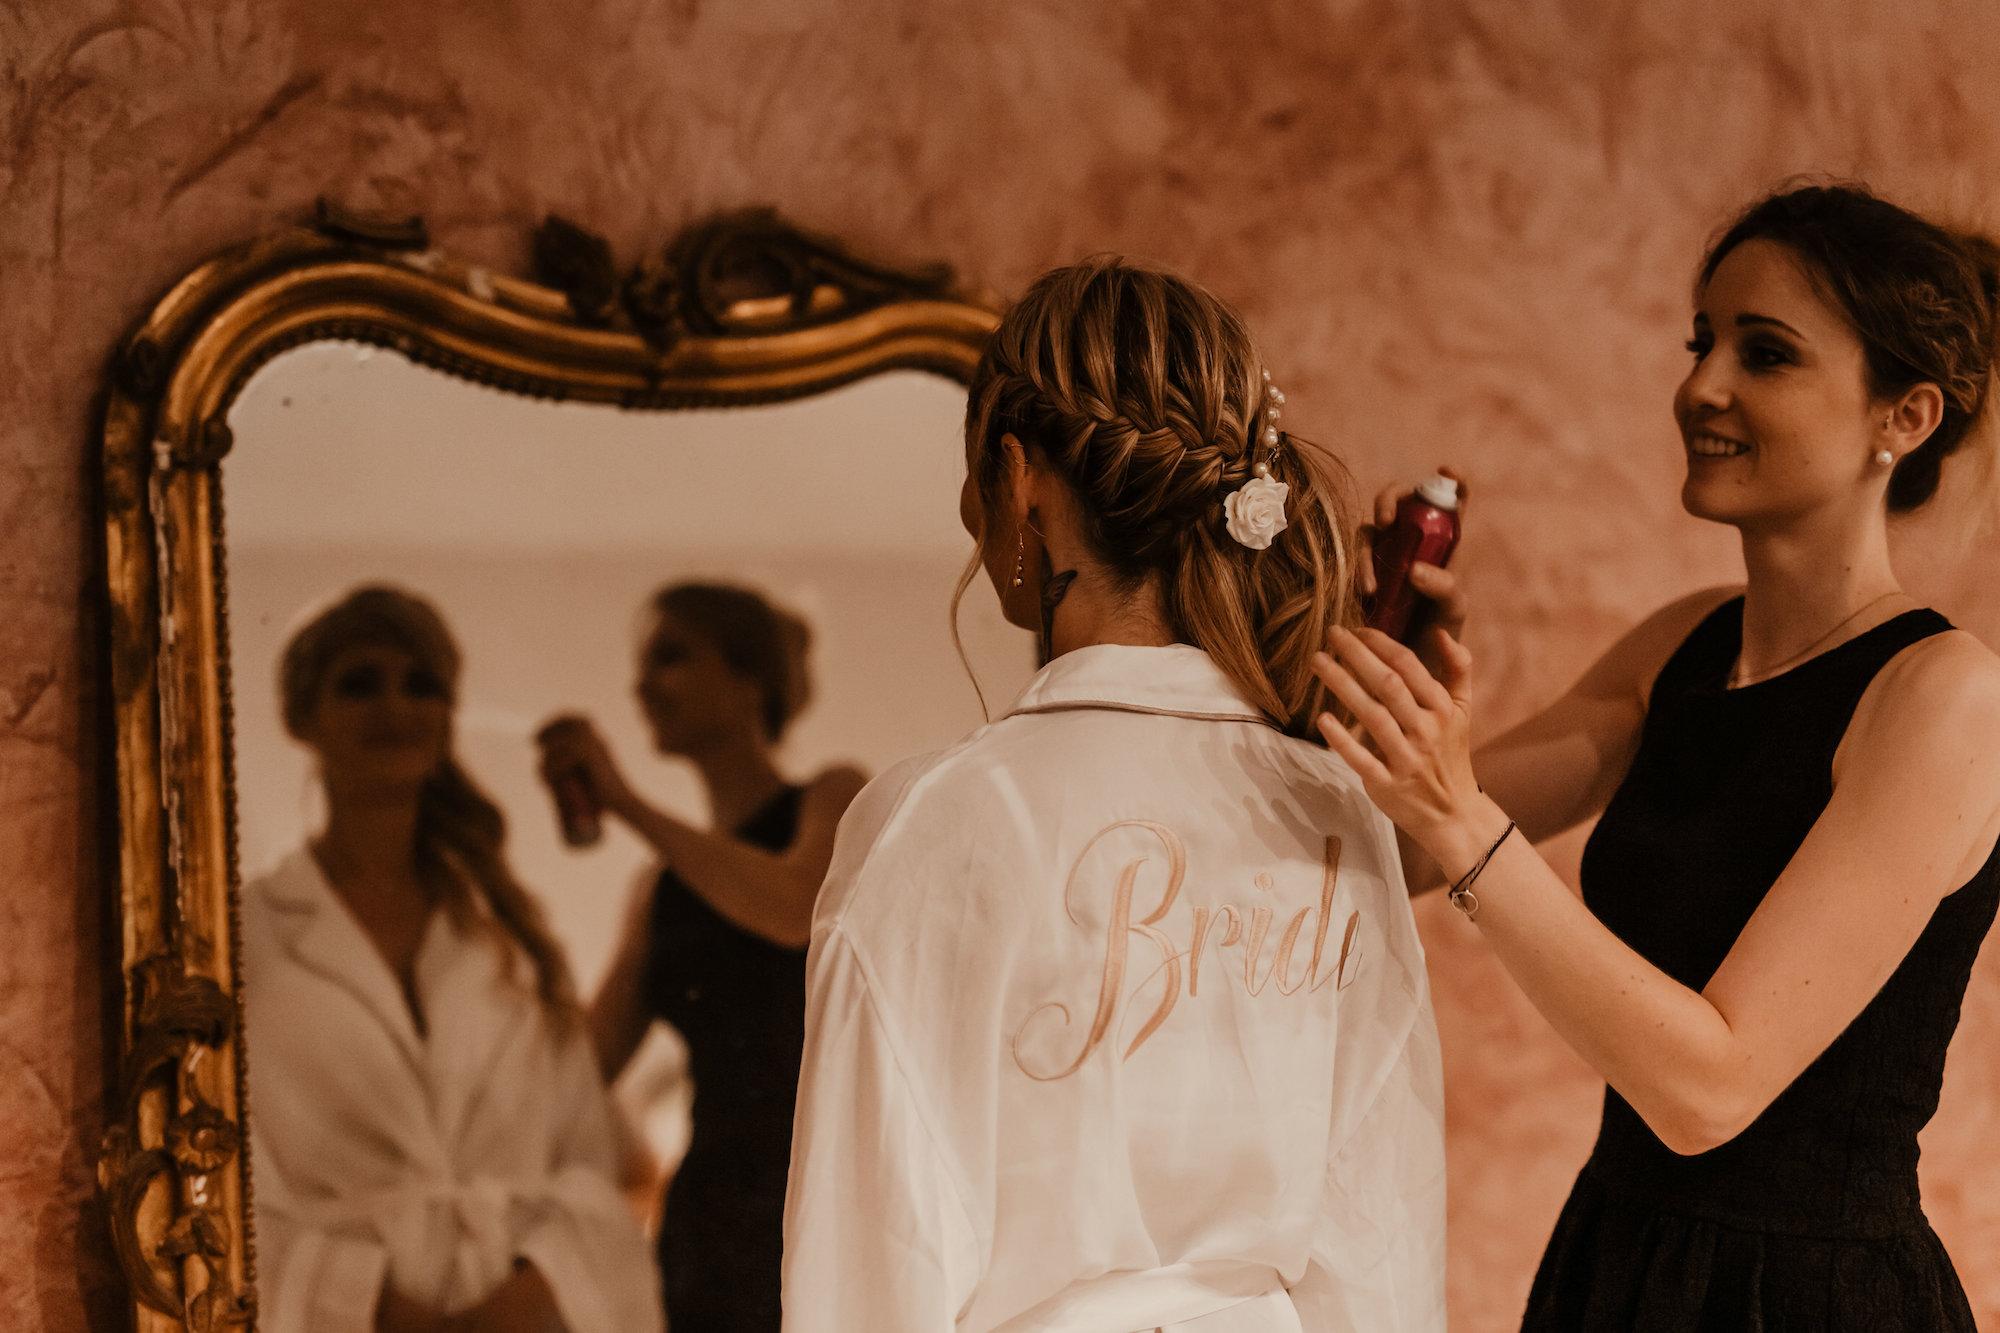 le coeur dans les etoiles - wedding planner - provence - luberon - alpilles - organisation - mariage - wedding - florine jeannot - coiffure mariee